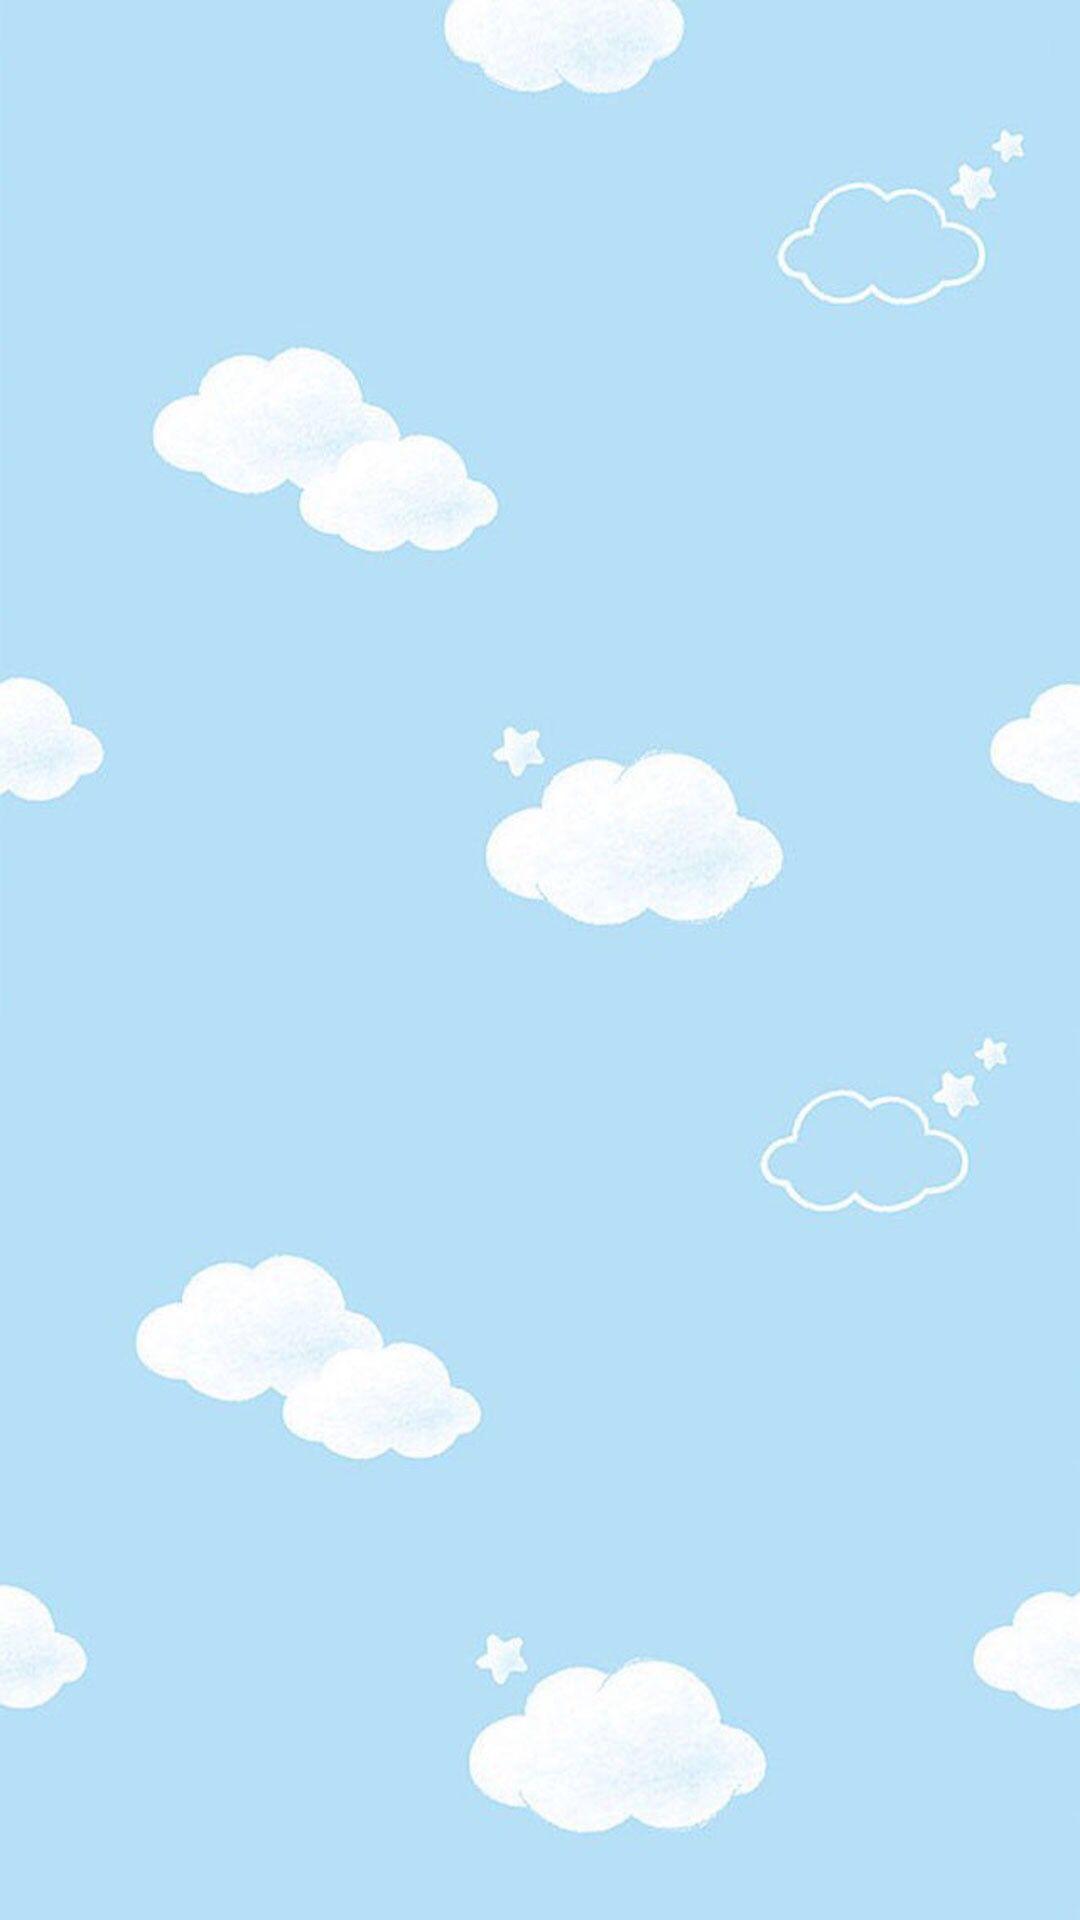 Blue white mini clouds stars iphone wallpaper phone